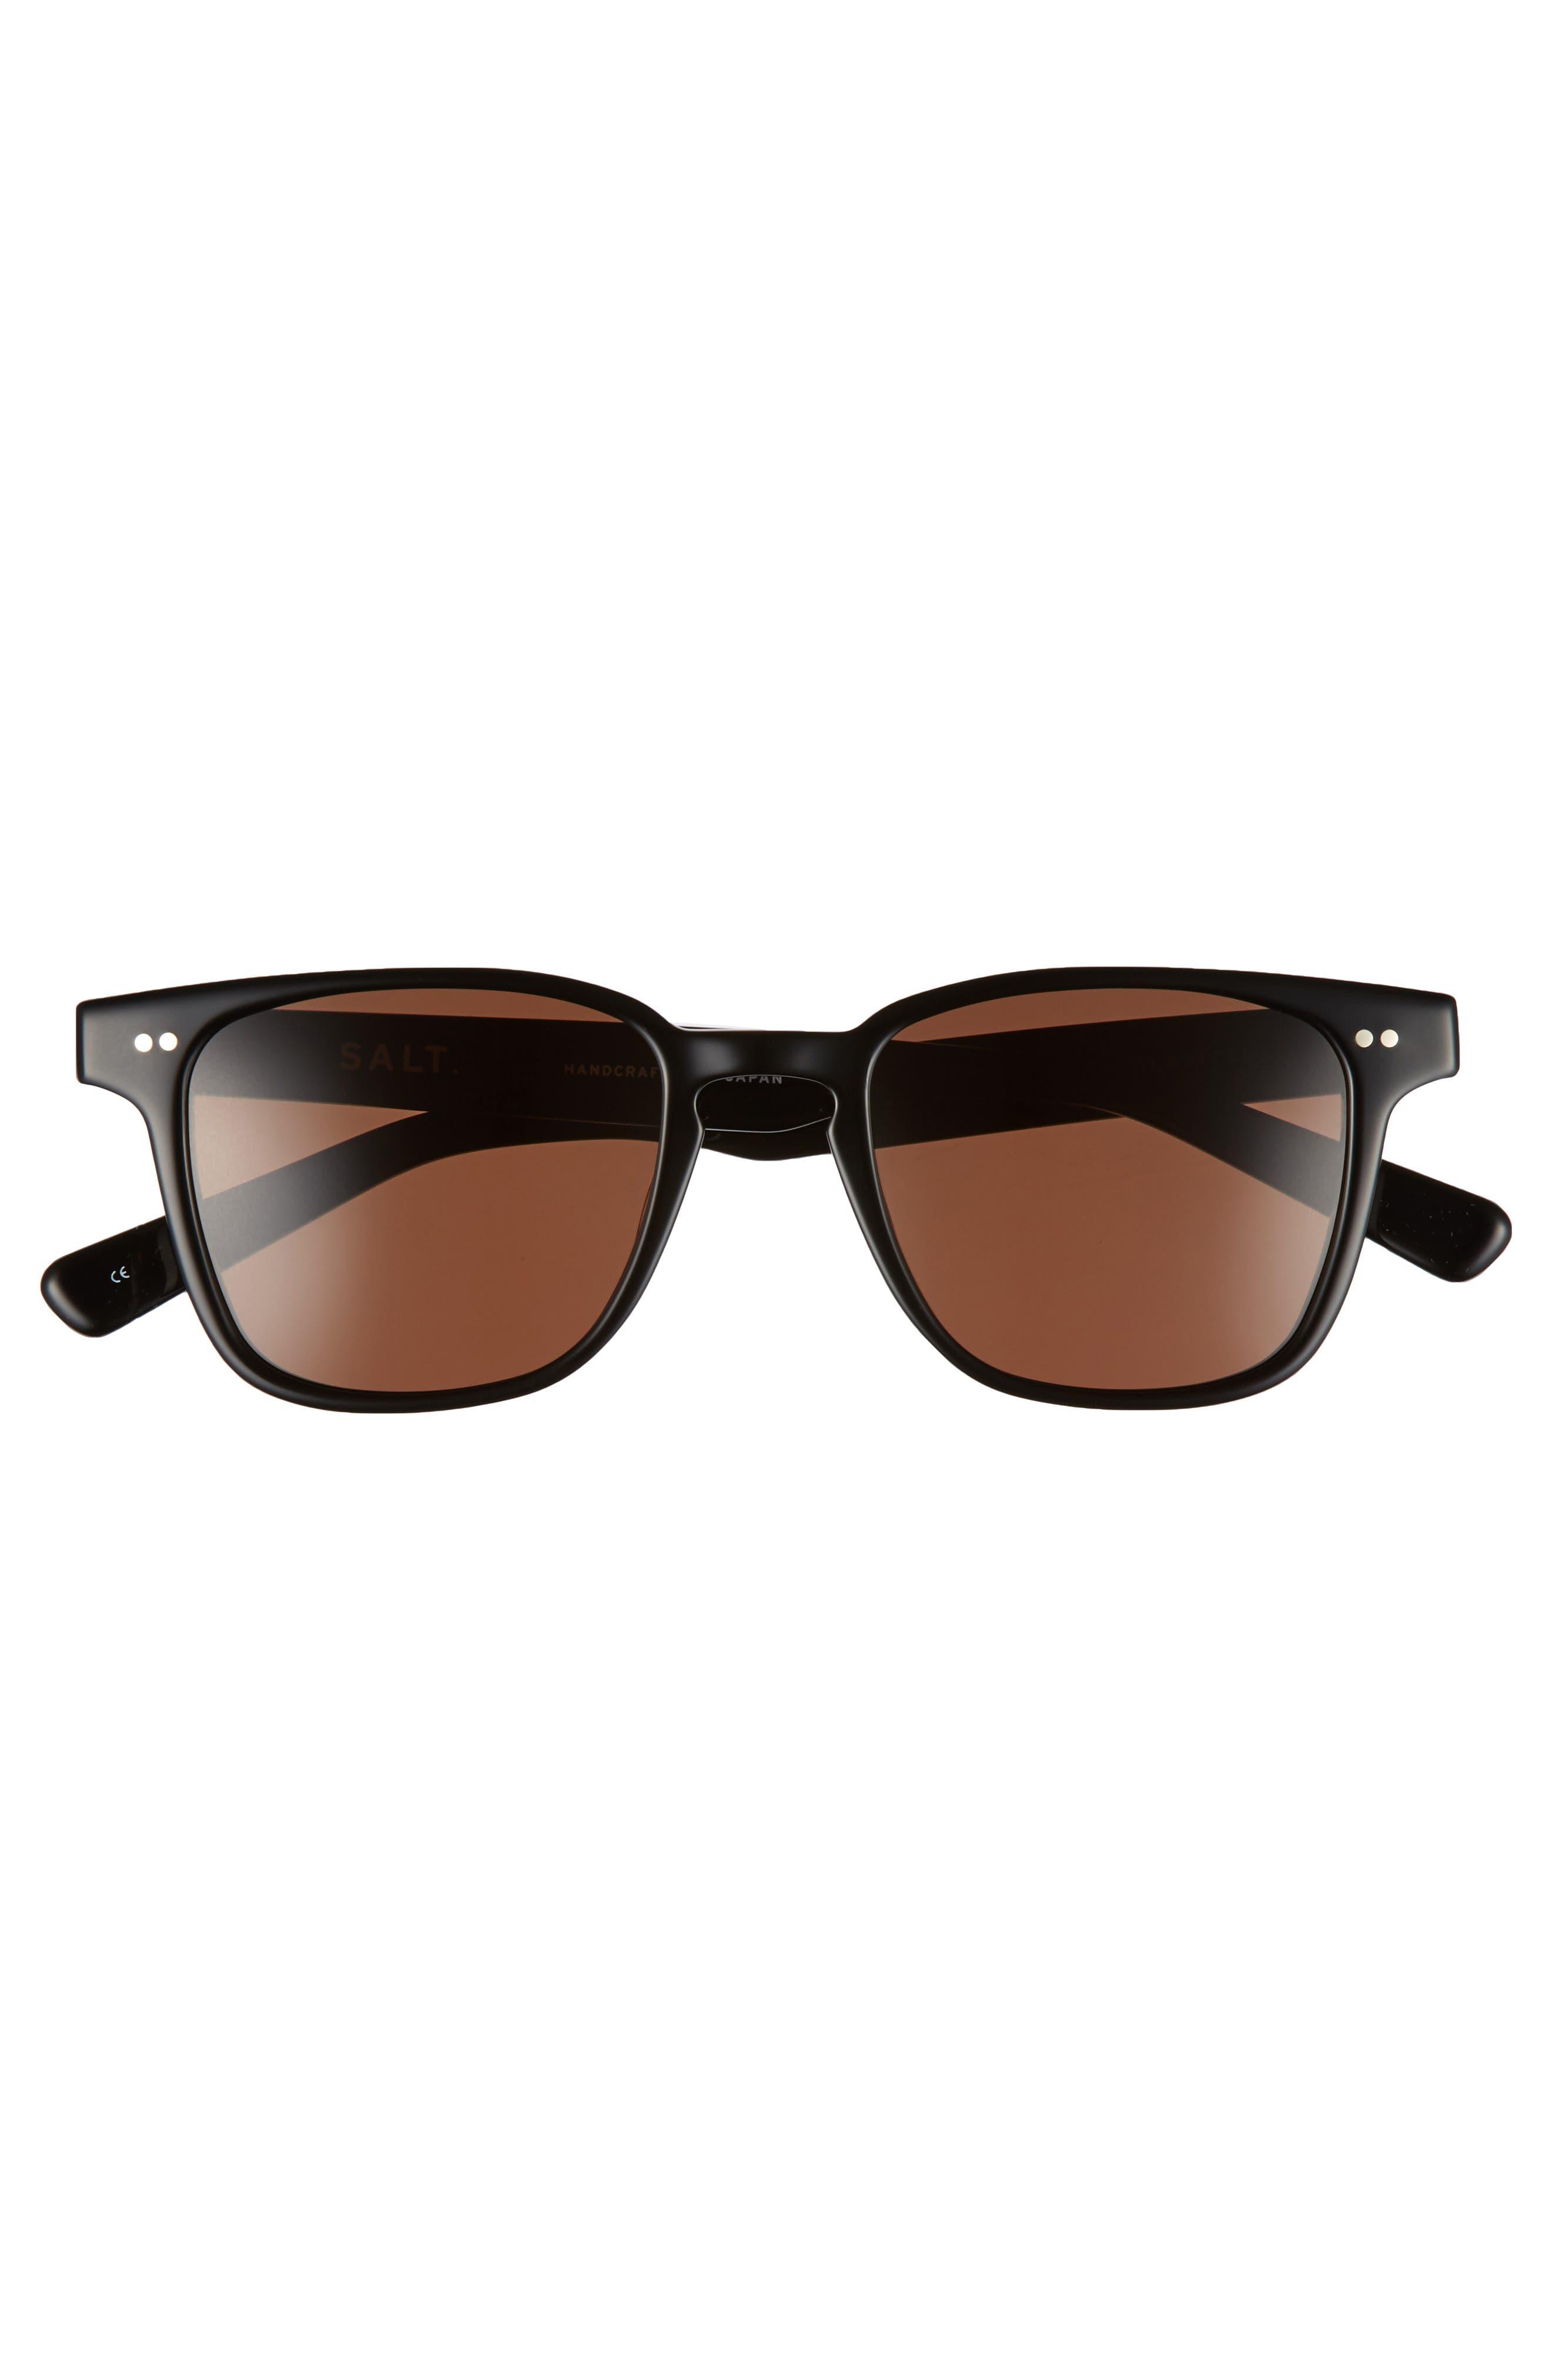 Reiner 51mm Polarized Sunglasses,                             Alternate thumbnail 2, color,                             BLACK